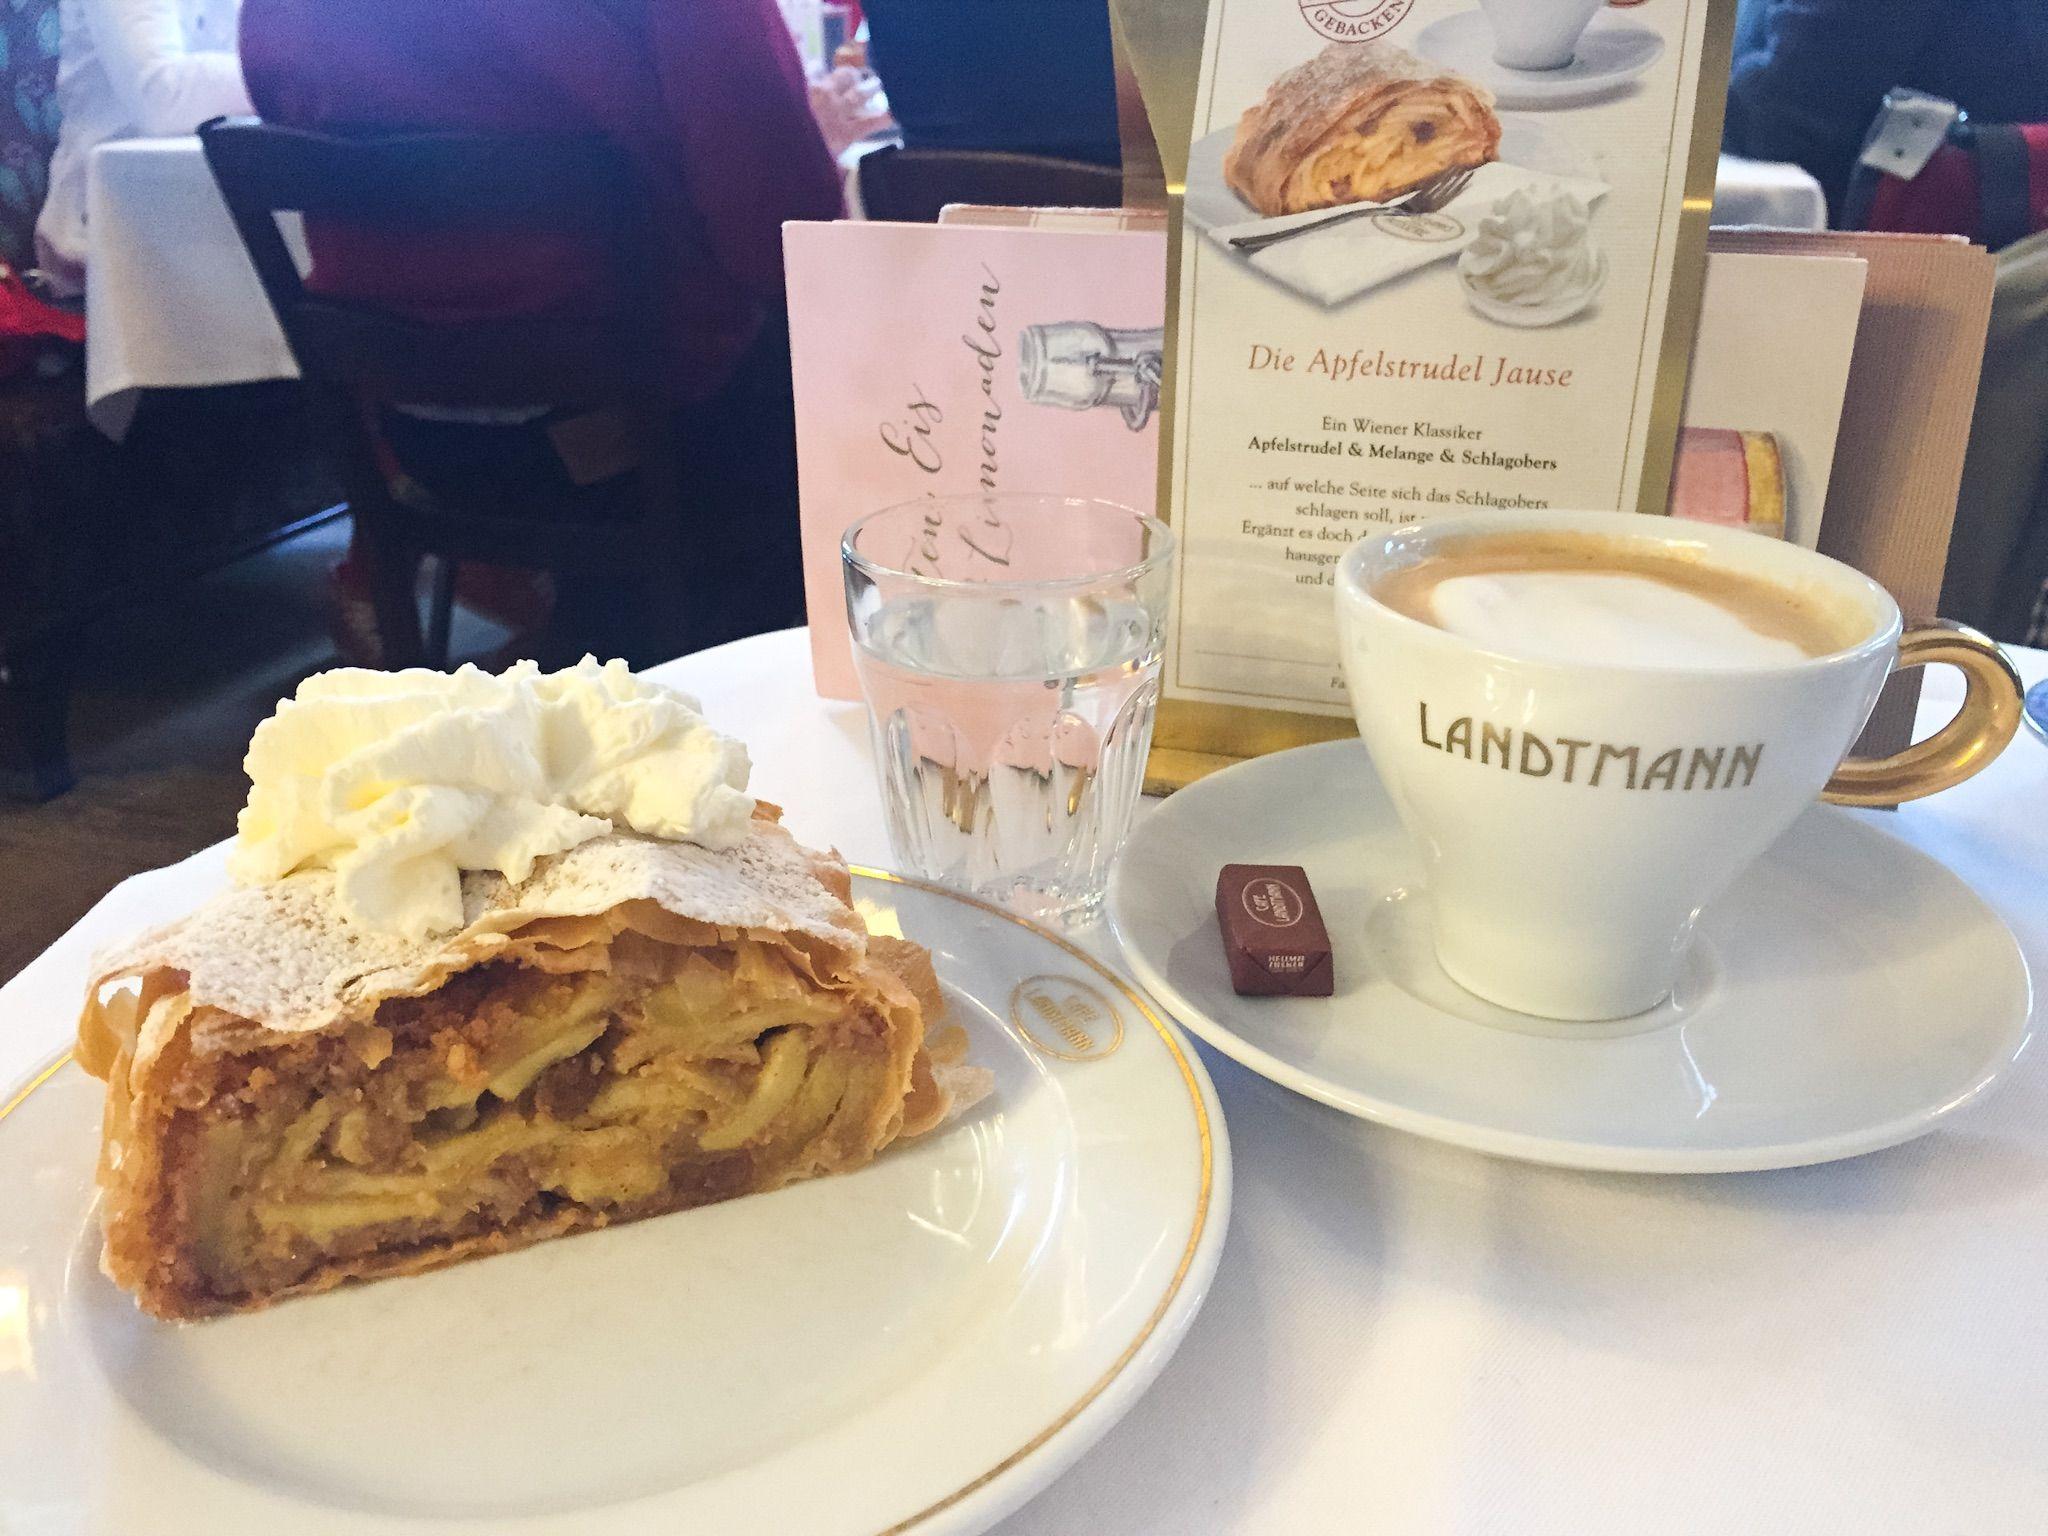 Cafe Landtmann American In Vienna Cafe Food Desserts